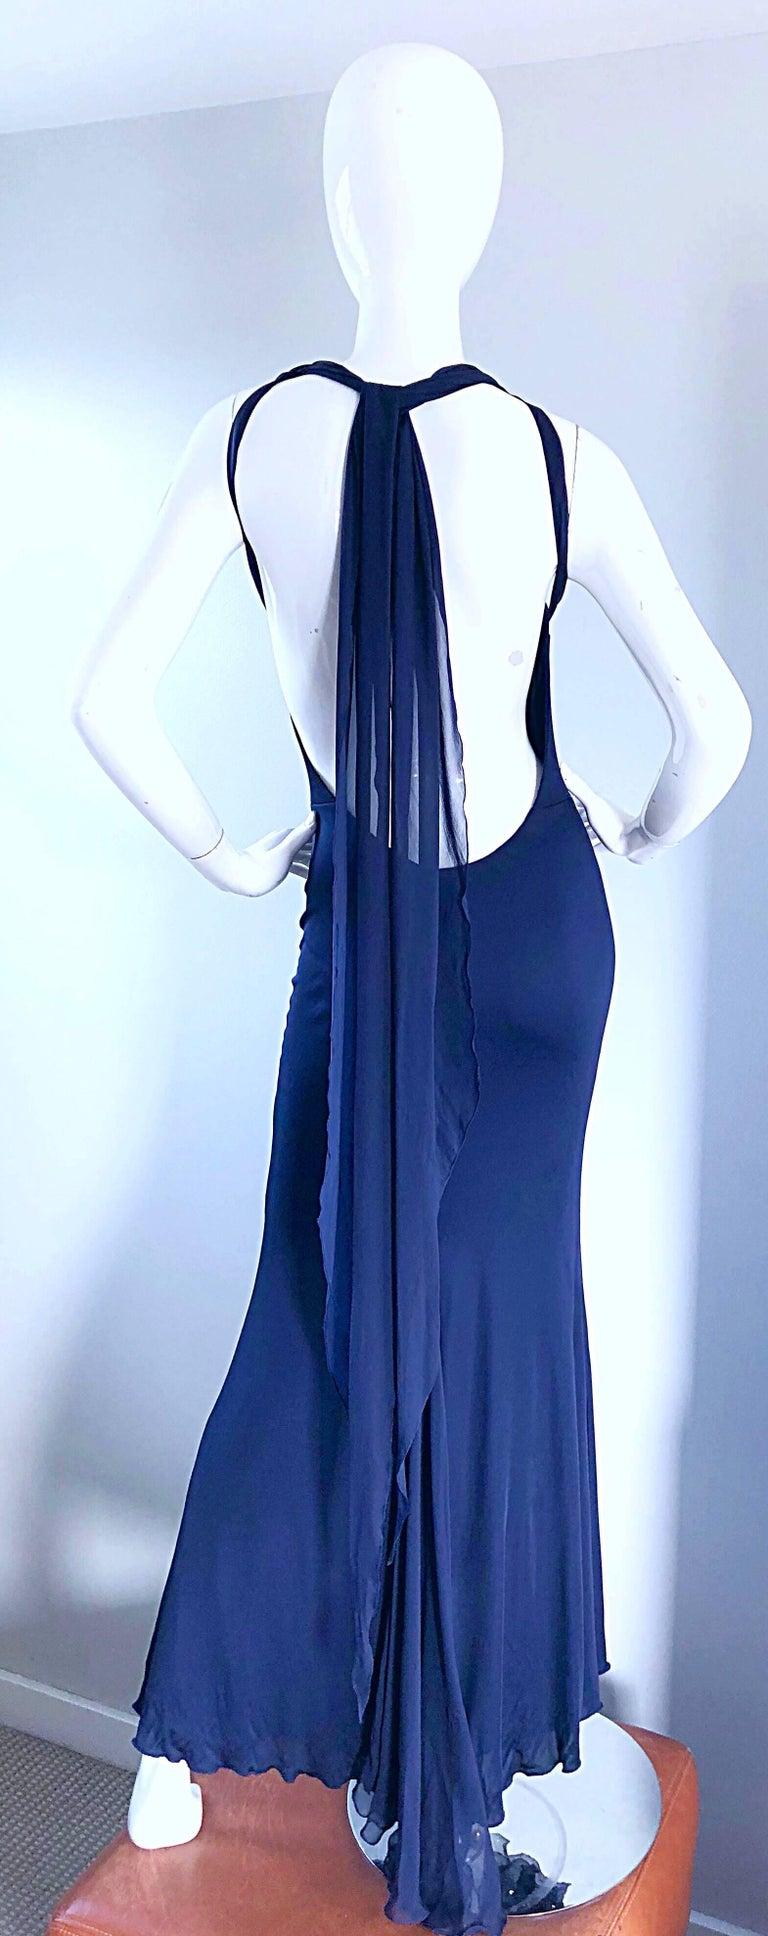 b09b131dd3 Women s Bill Blass Vintage Silk Jersey and Chiffon Navy Blue Purple Grecian  Evening Gown For Sale